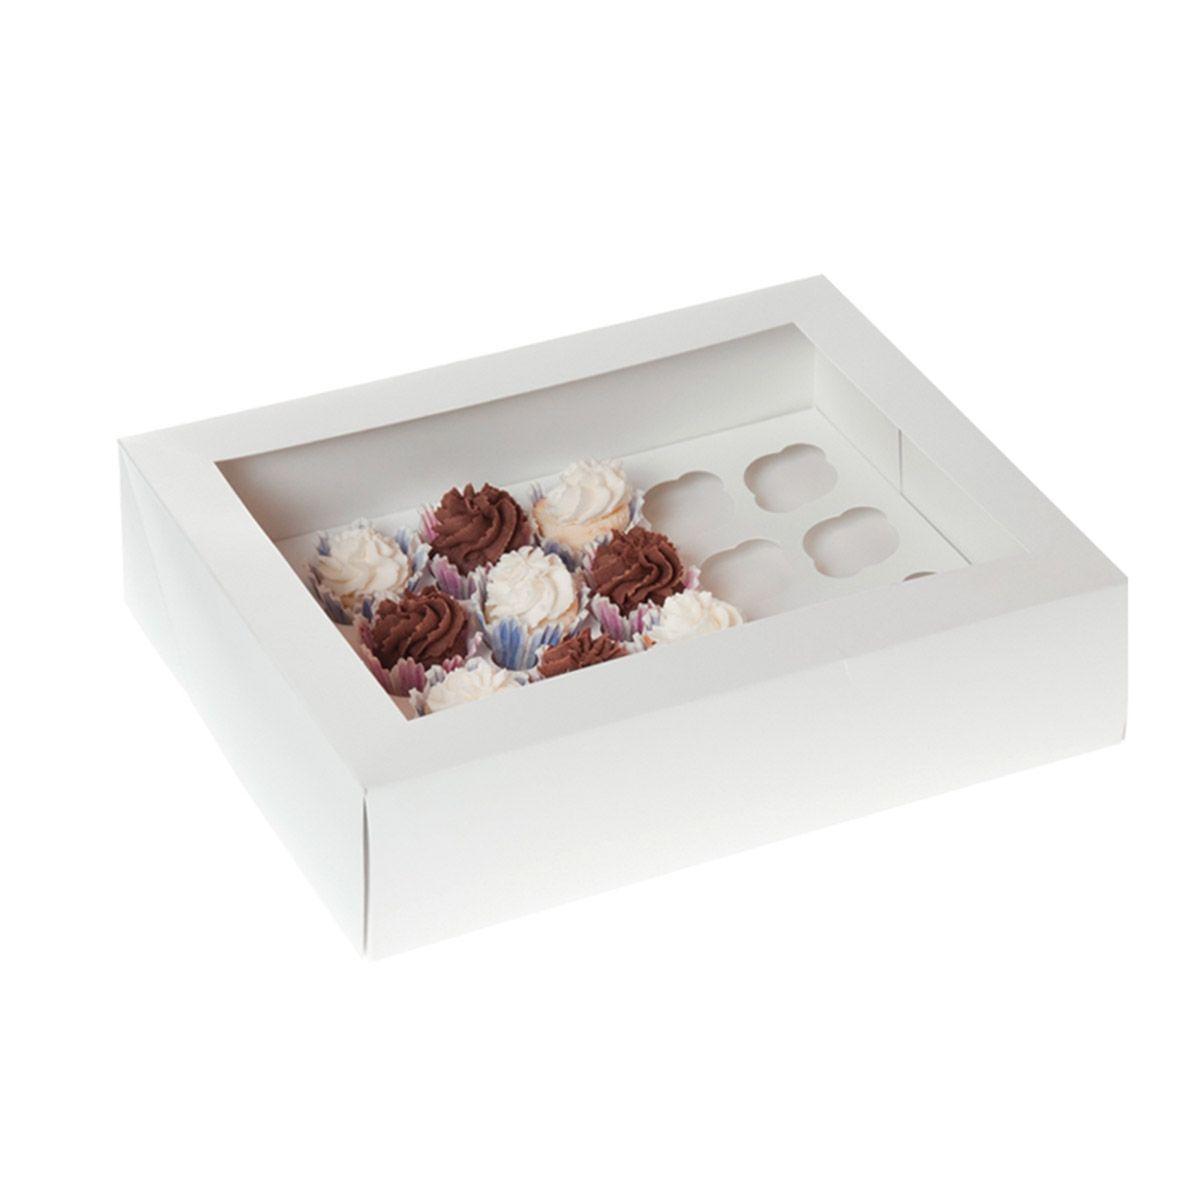 Mini Cupcake Box 33,9 x 25,4 x 9,6 cm   2 Stk.